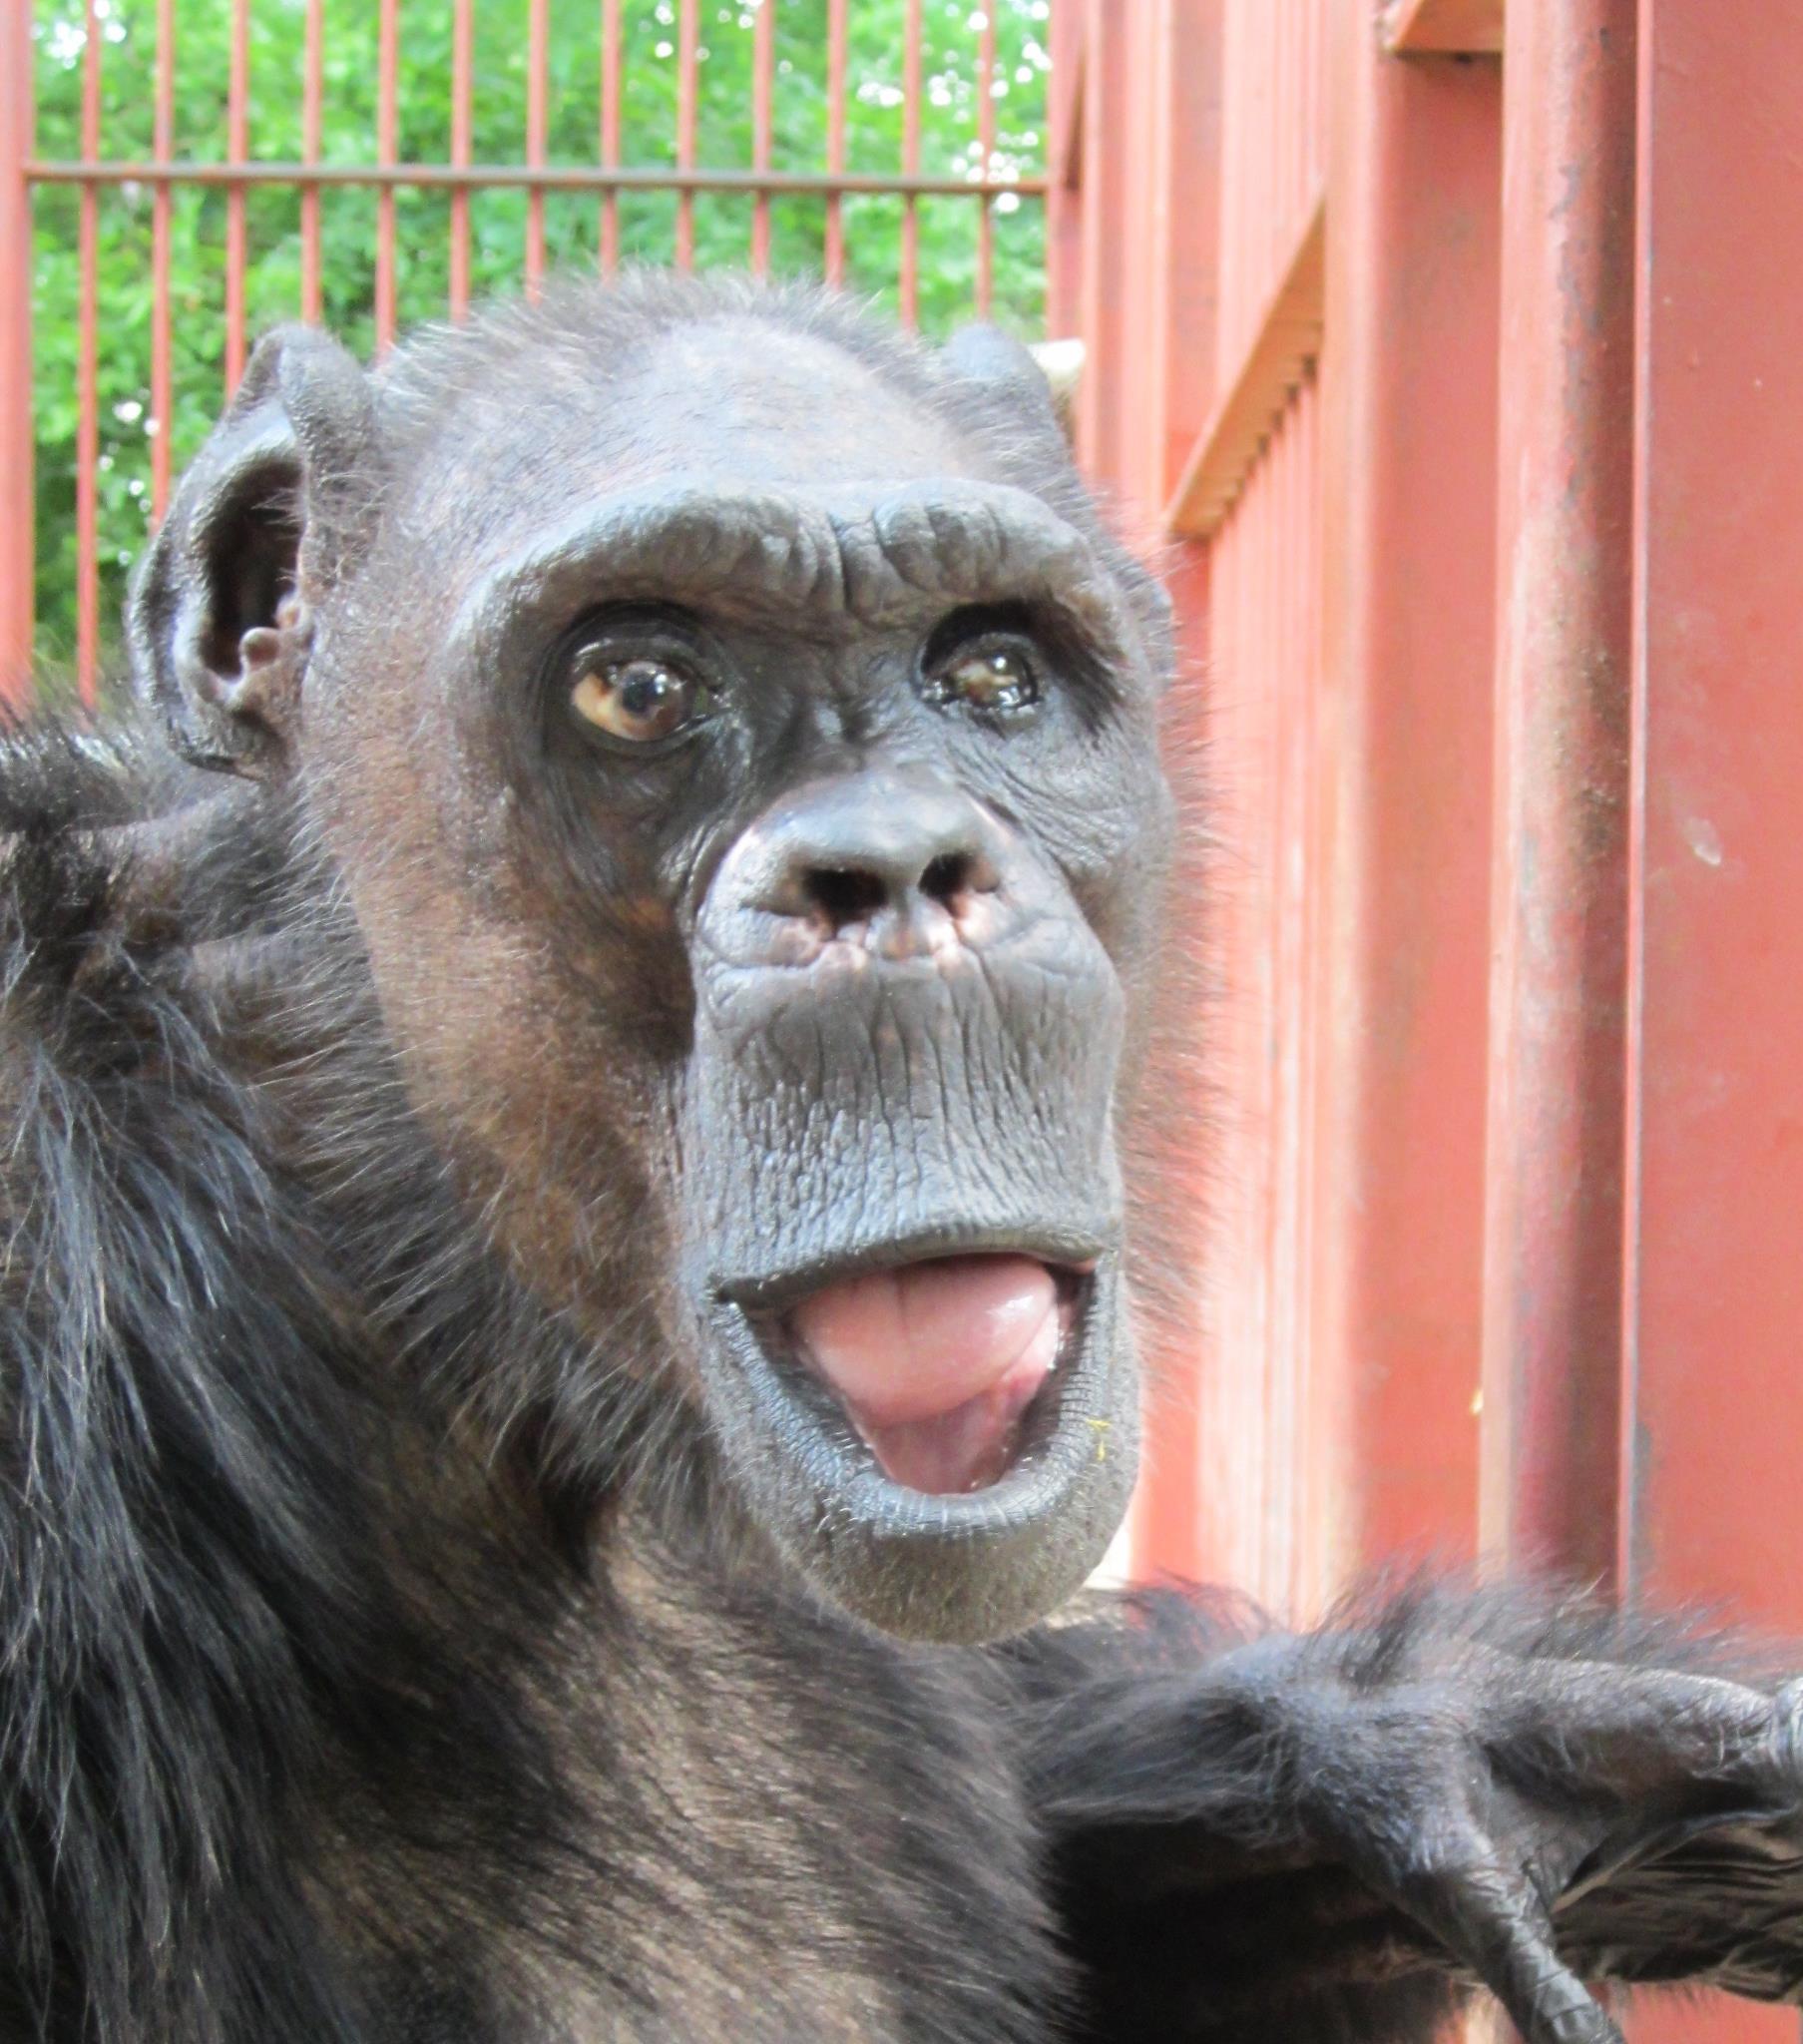 Oliver, famed chimpanzee, dies